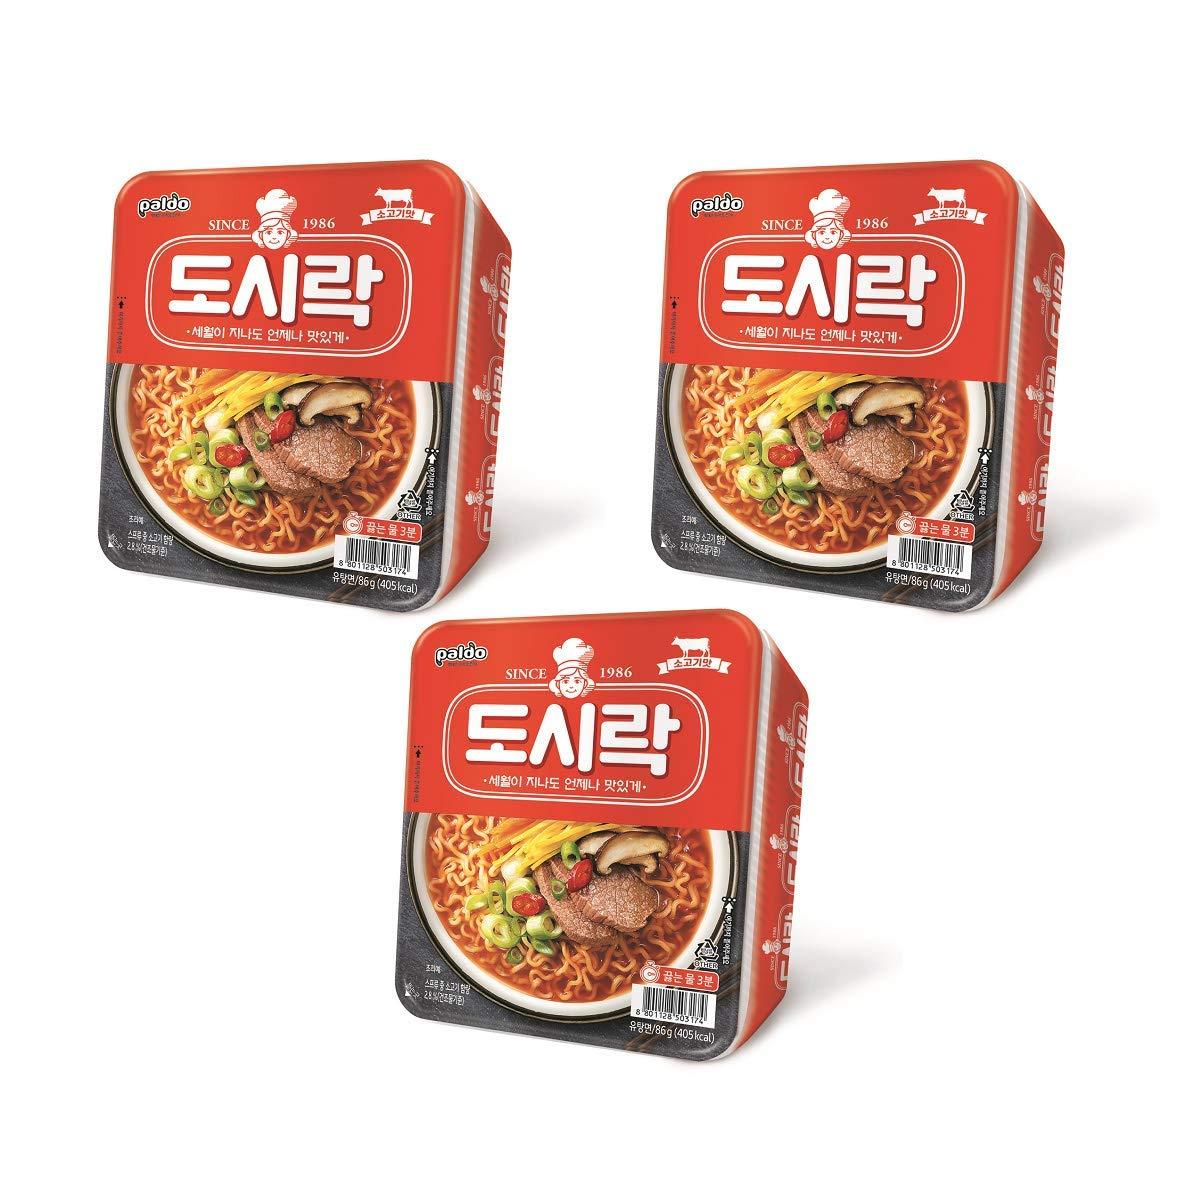 [Paldo] Dosirak(Lunch box) Cup Noodle 86g × 3 / Instant ramen / Korean food / Korean ramen (overseas direct shipment)